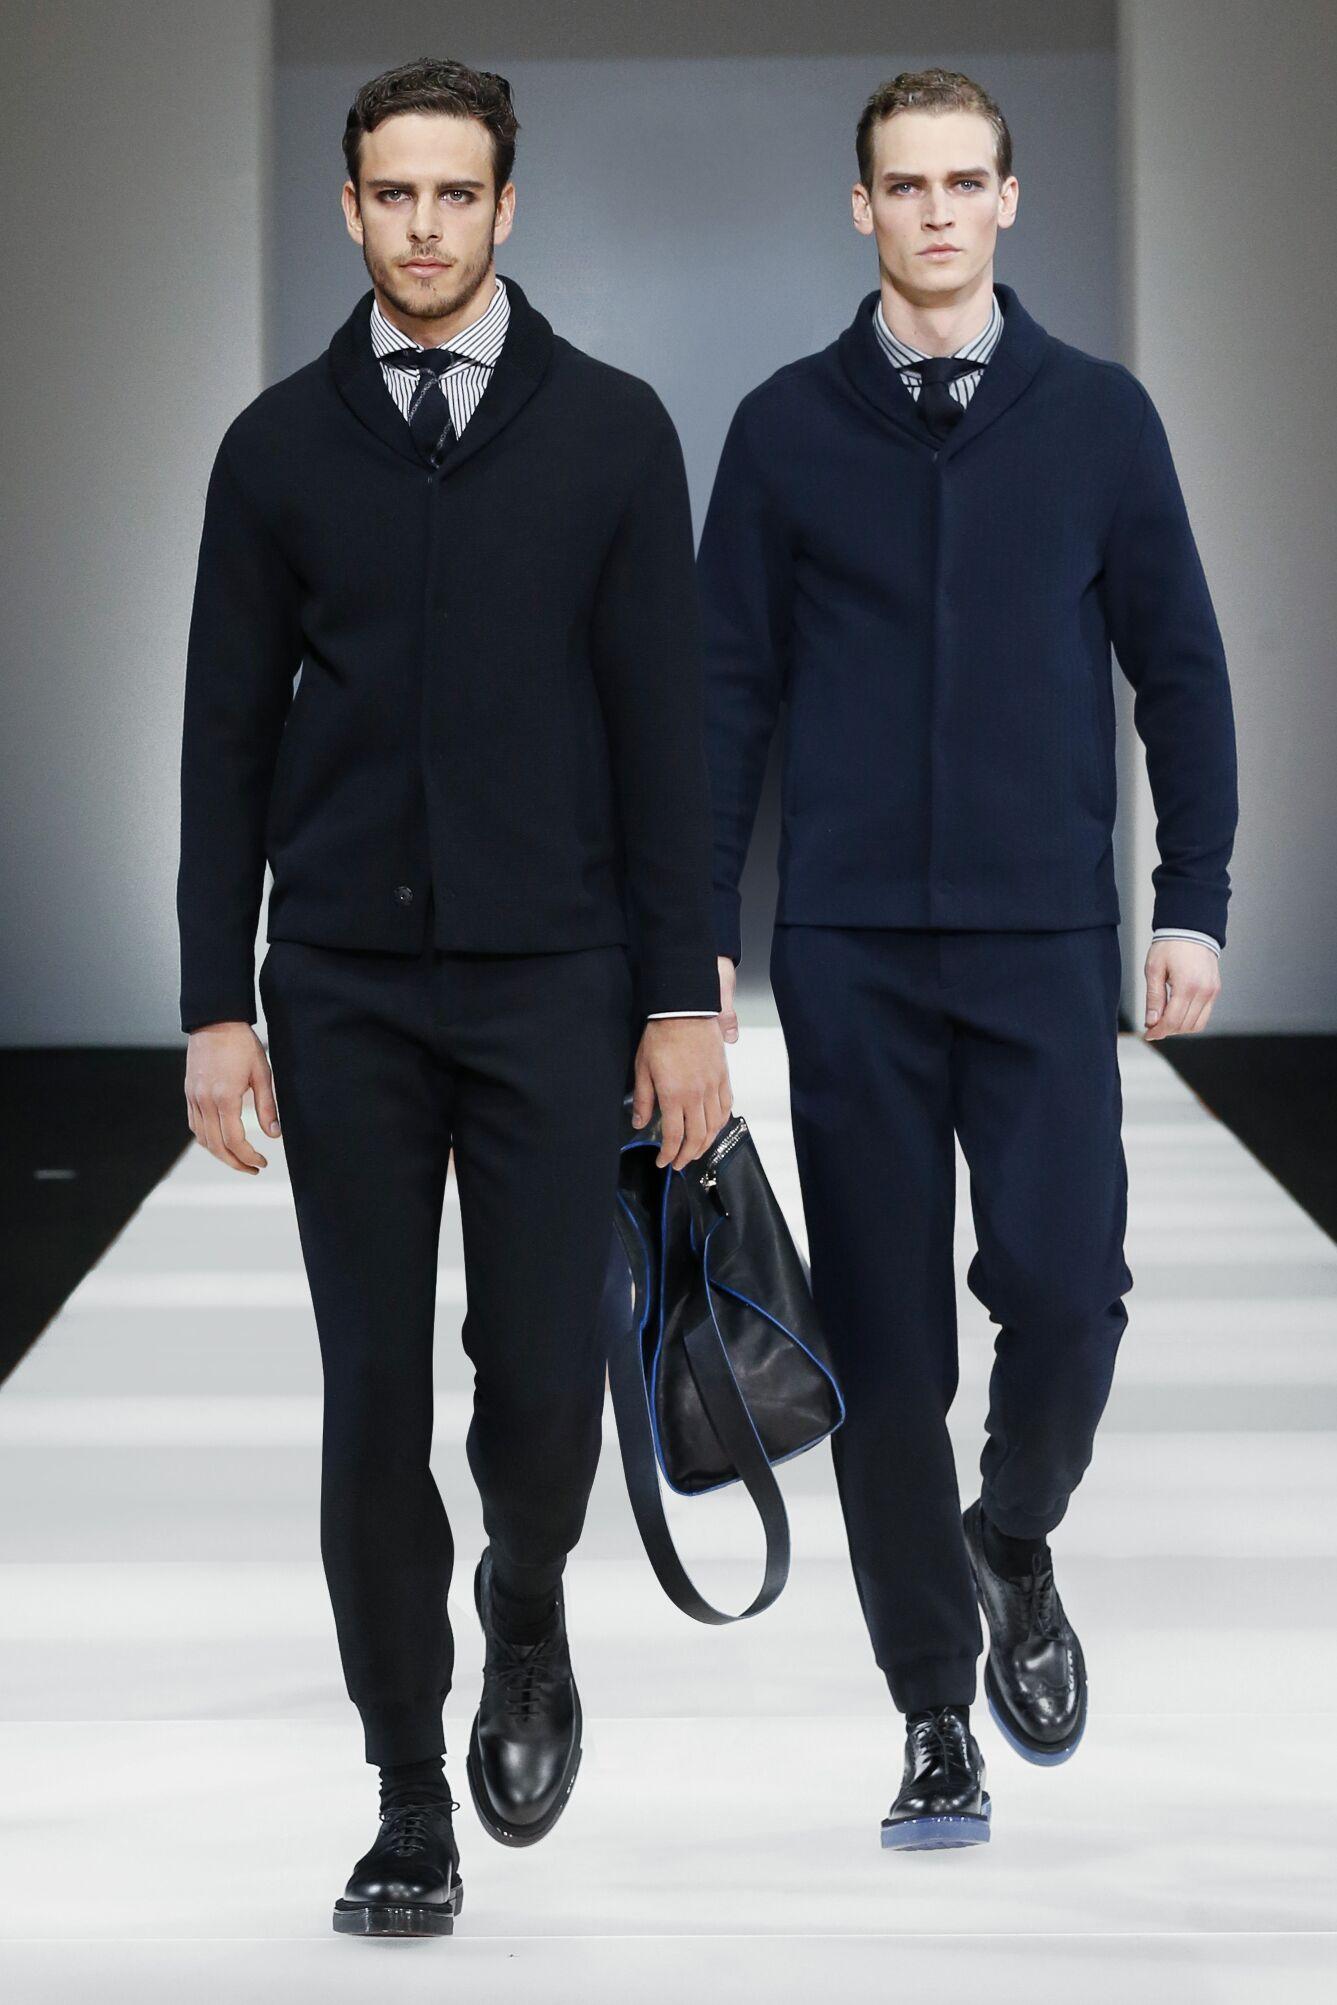 2015 16 Catwalk Emporio Armani Fall Winter Men's Collection Milano Fashion Week